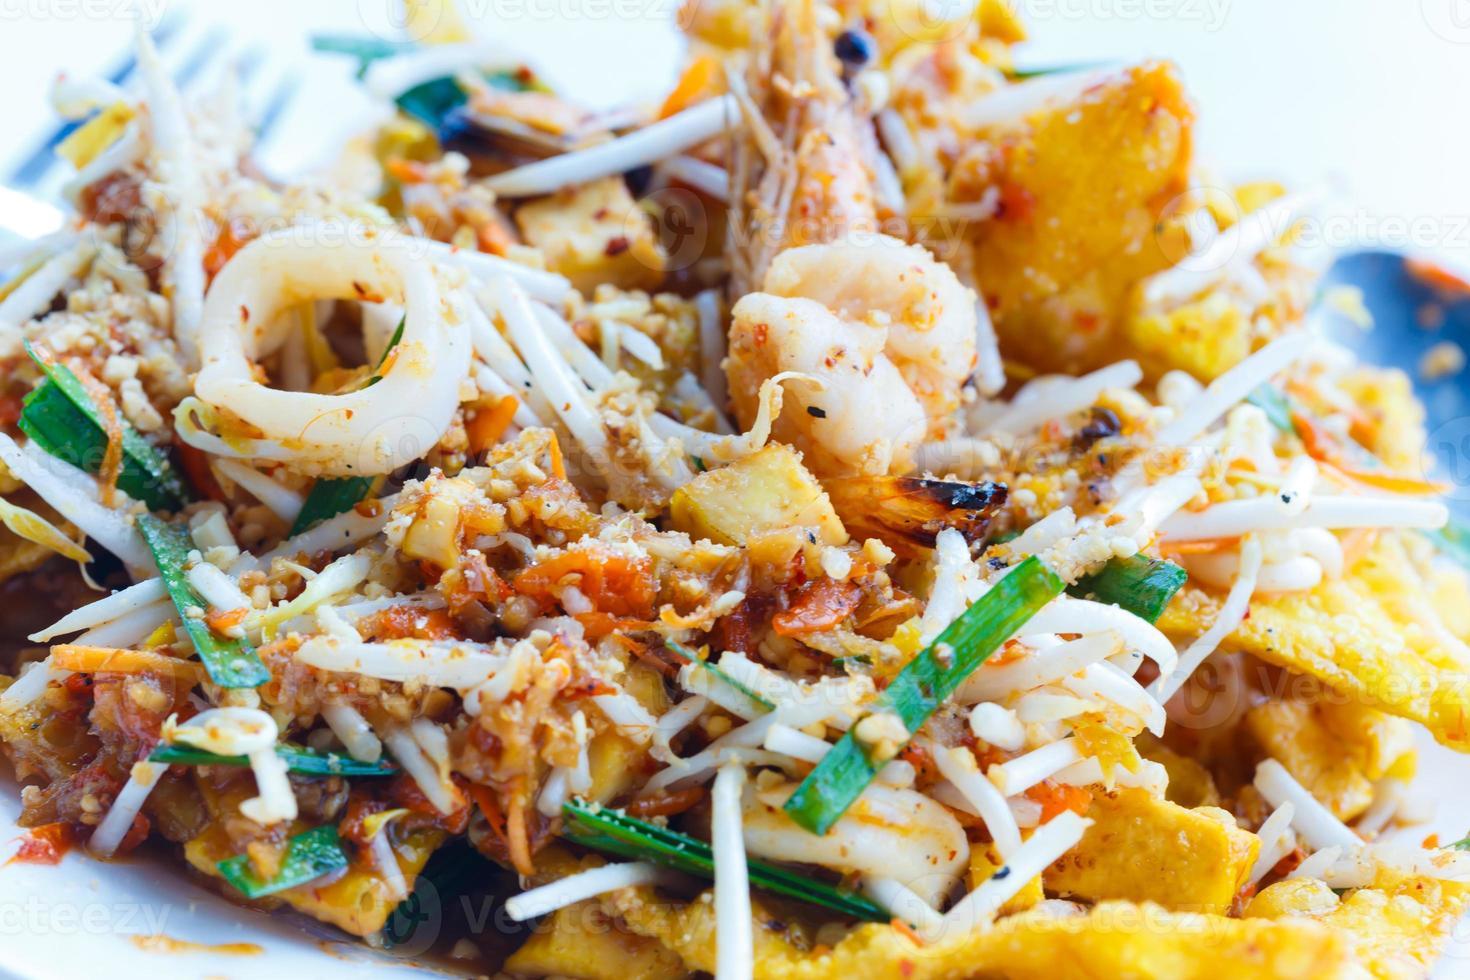 almofada tailandesa mexa macarrão frito da Tailândia no prato branco foto